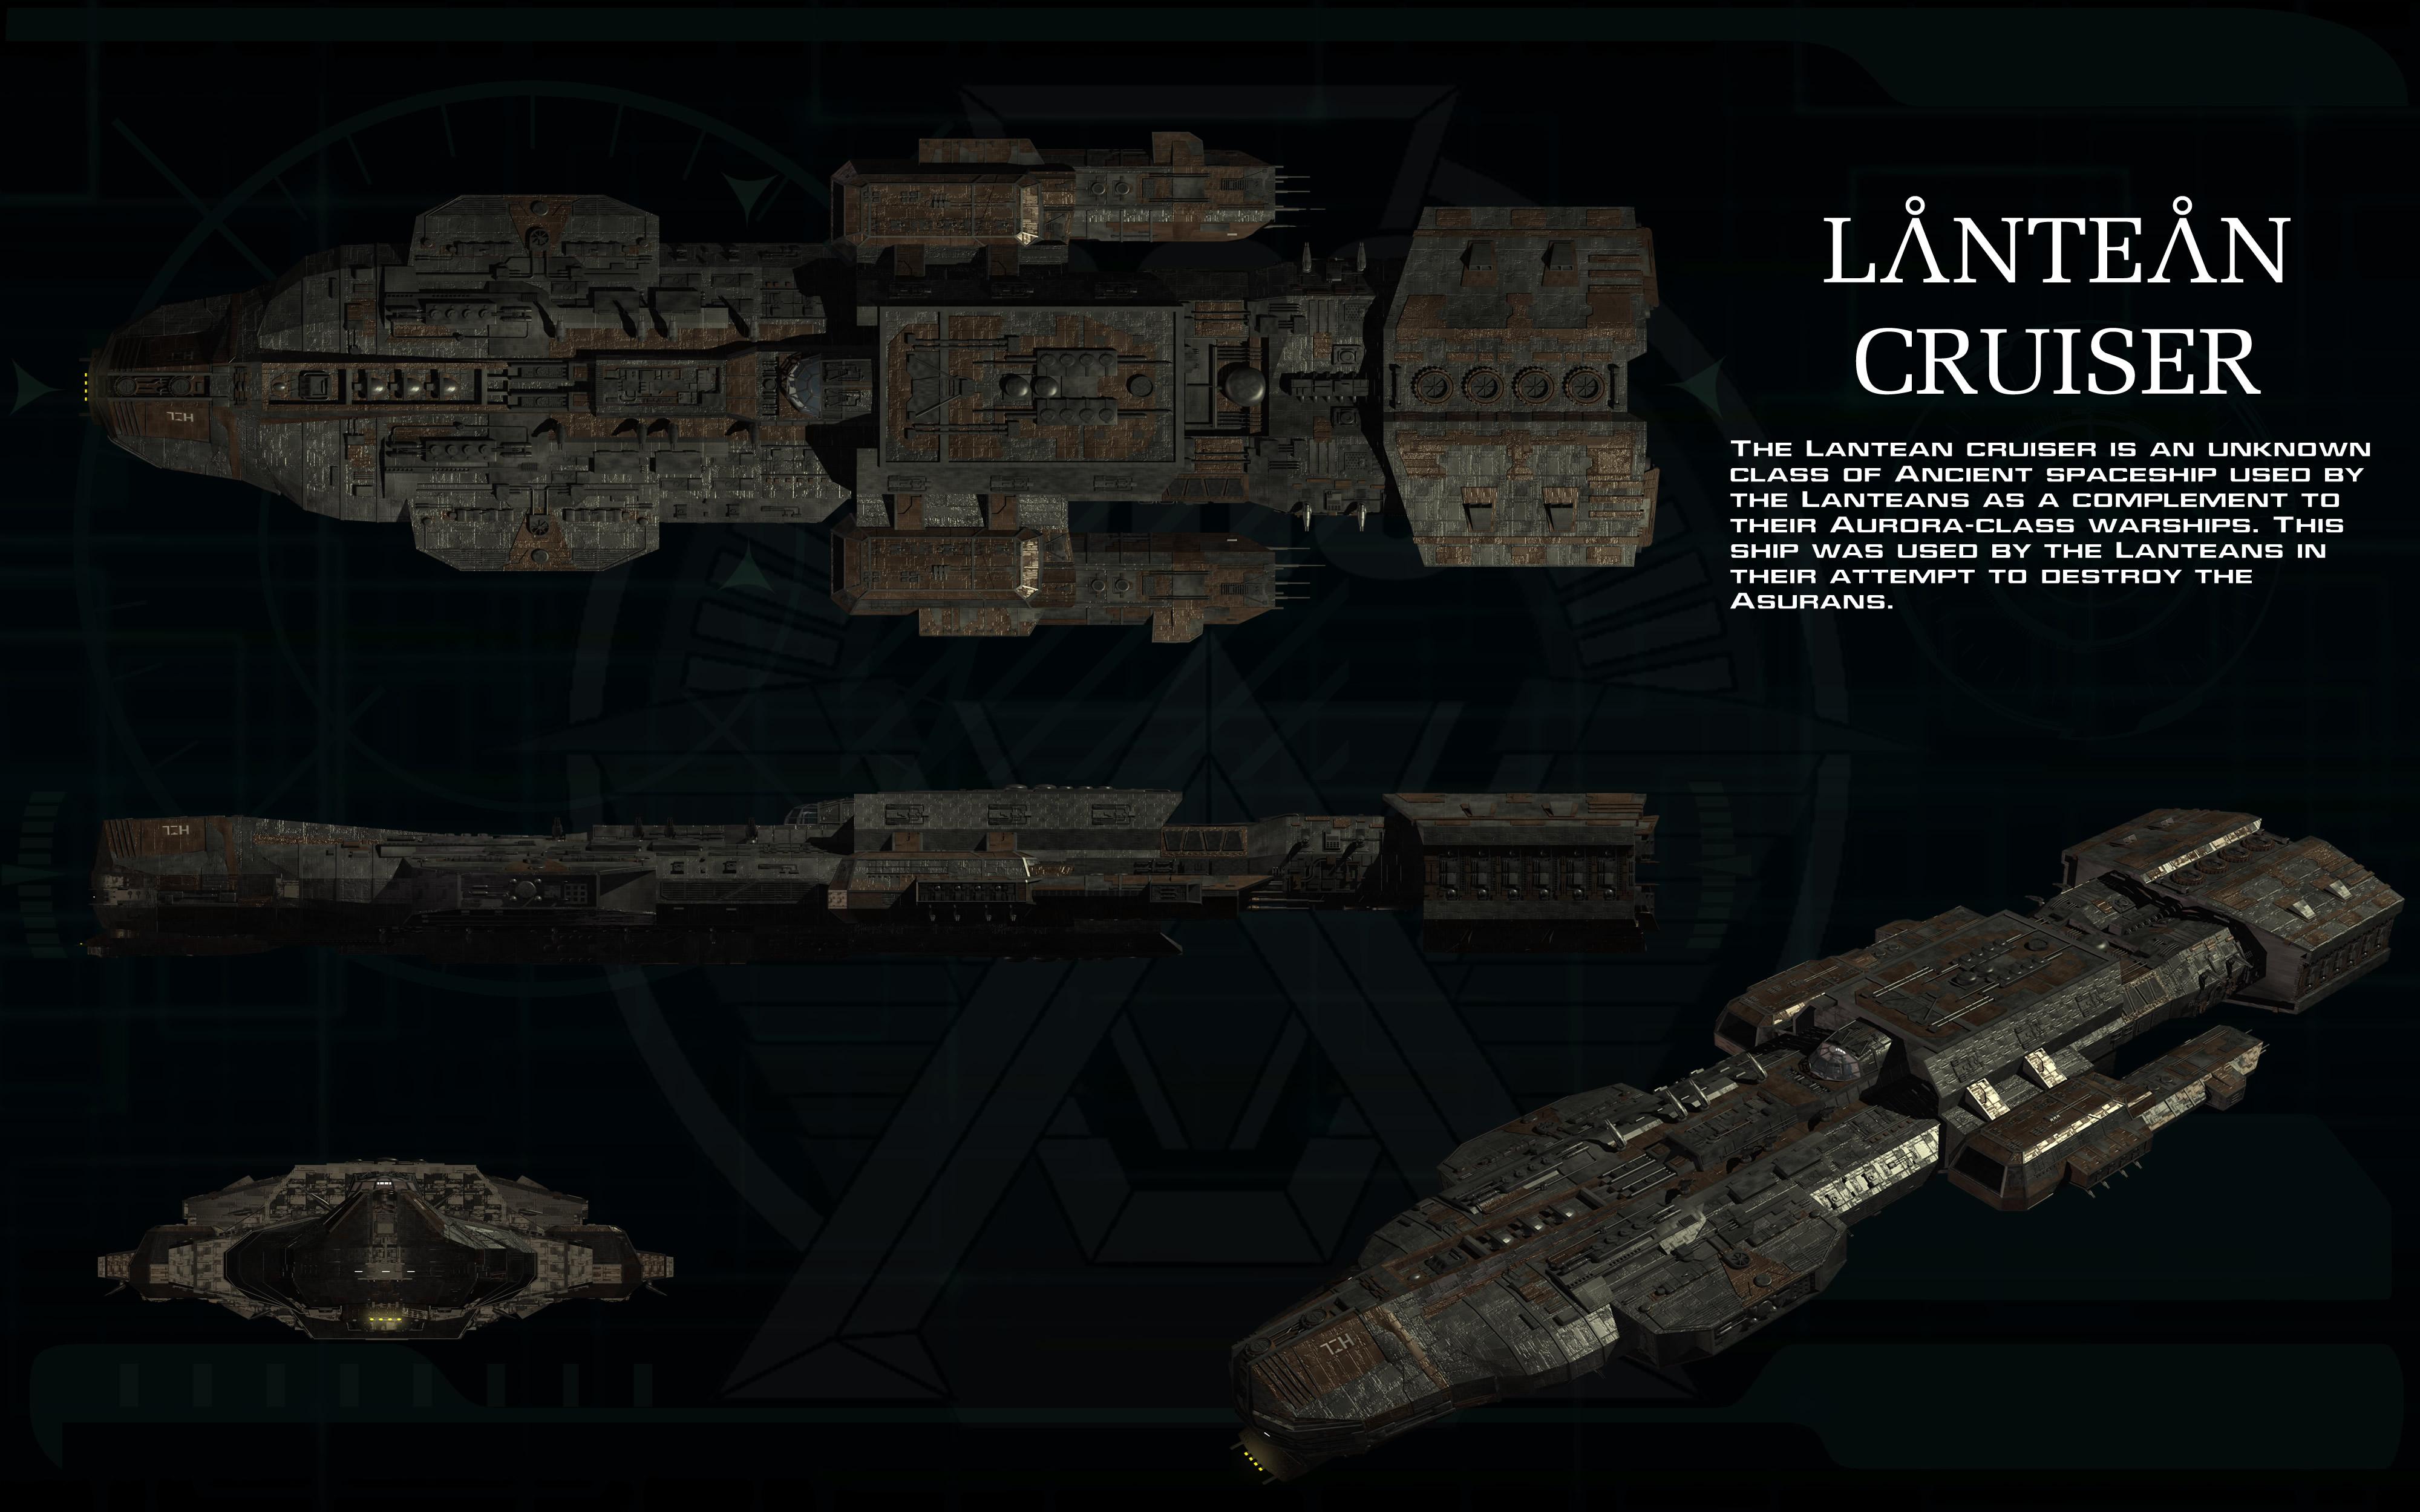 Lantean Cruiser ortho by unusualsuspex